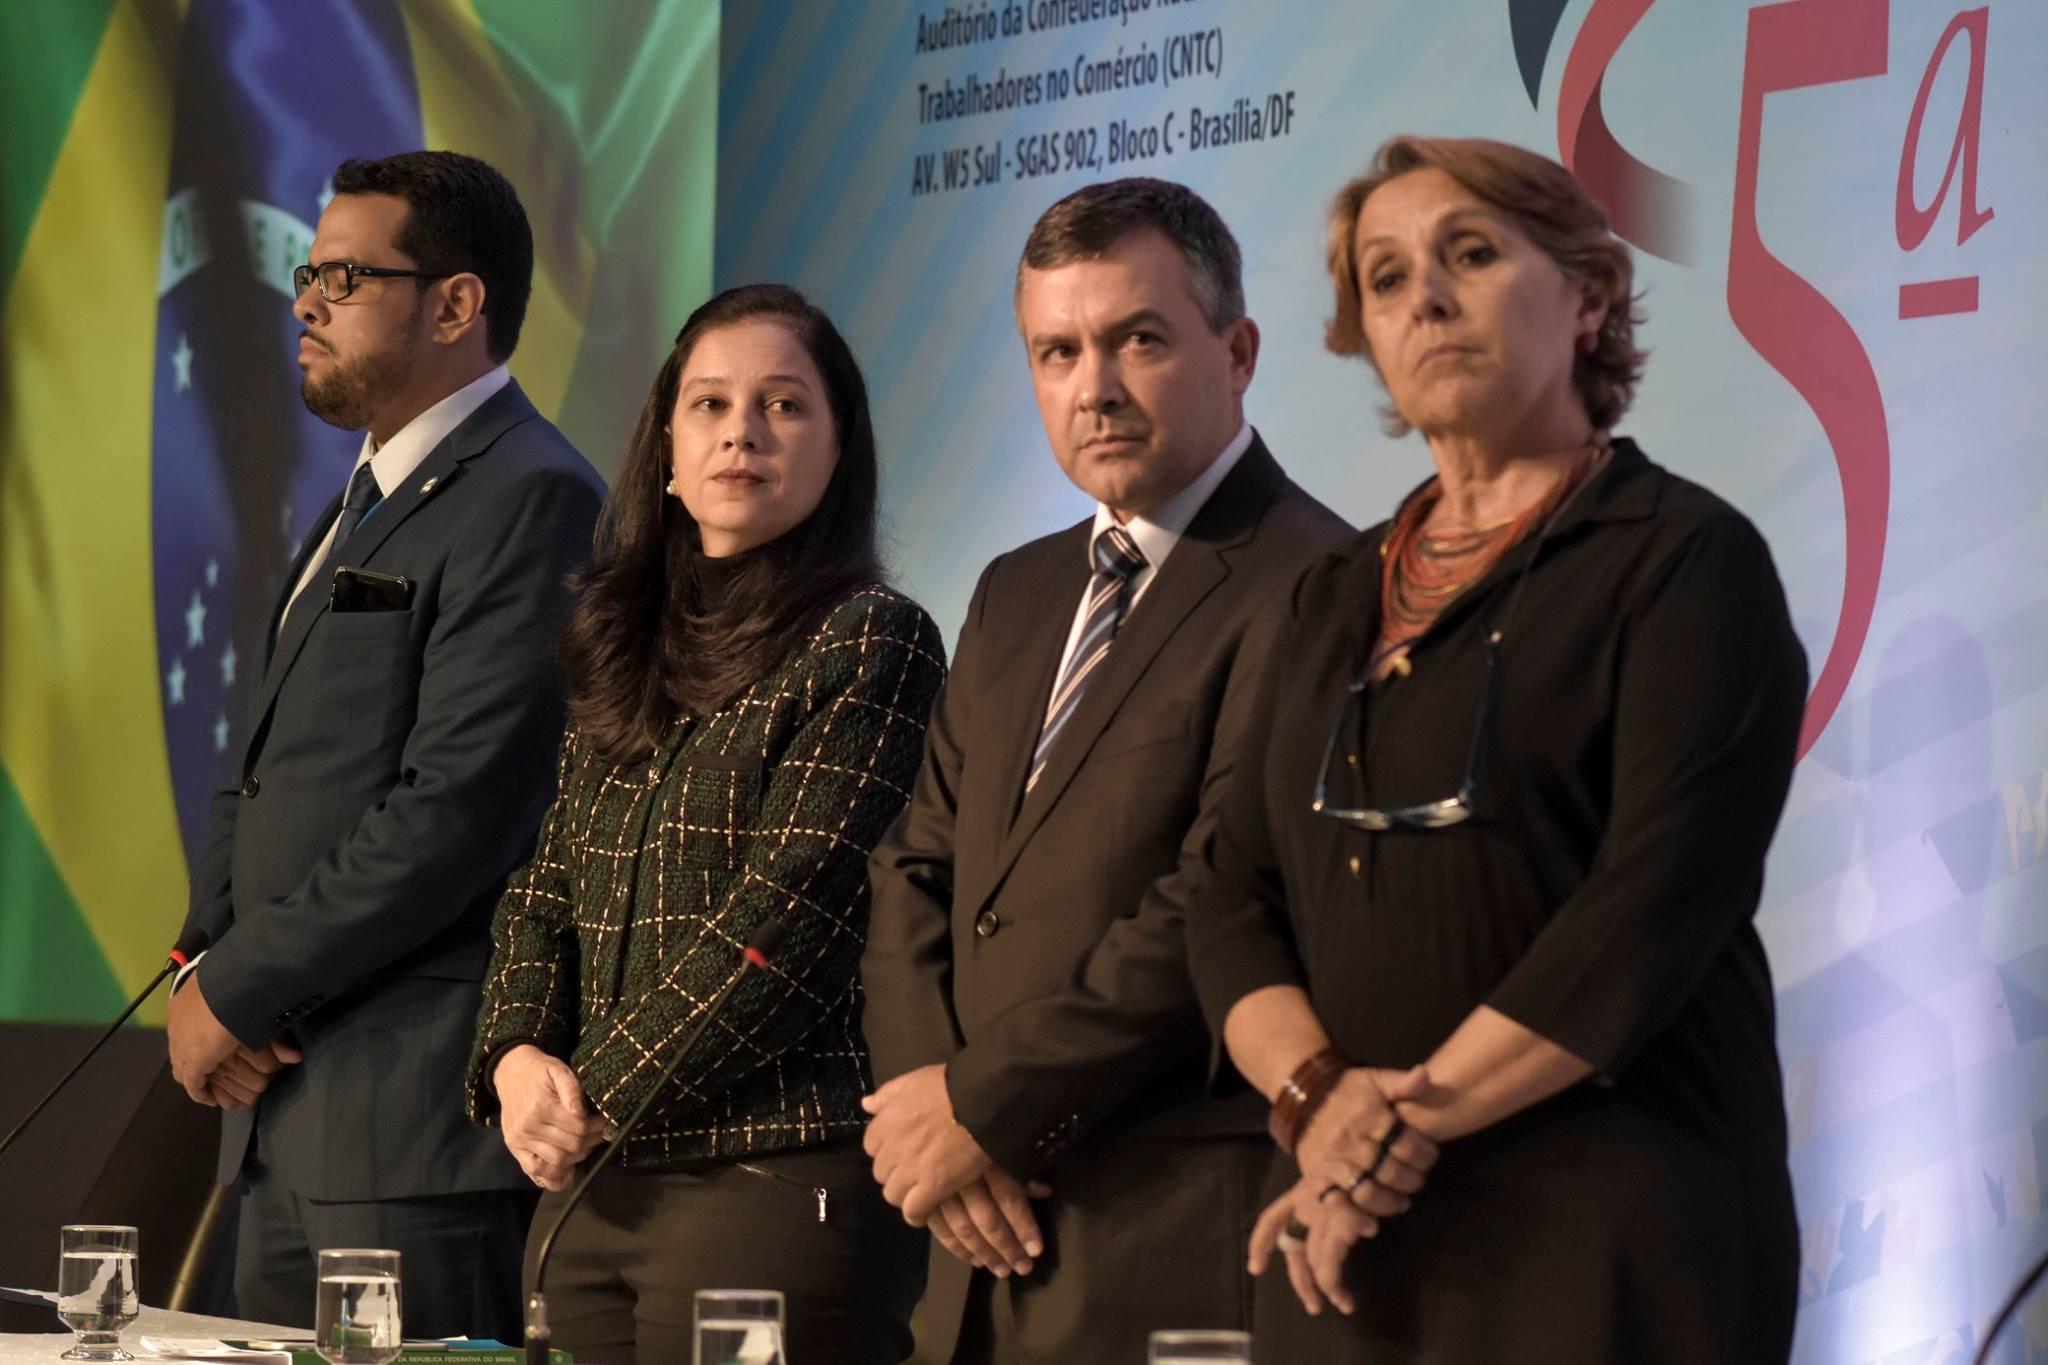 Marcelino Rodrigues, Grace Mendonça, Rudnei Marques e Erika Kokay. Foto: Fonacate